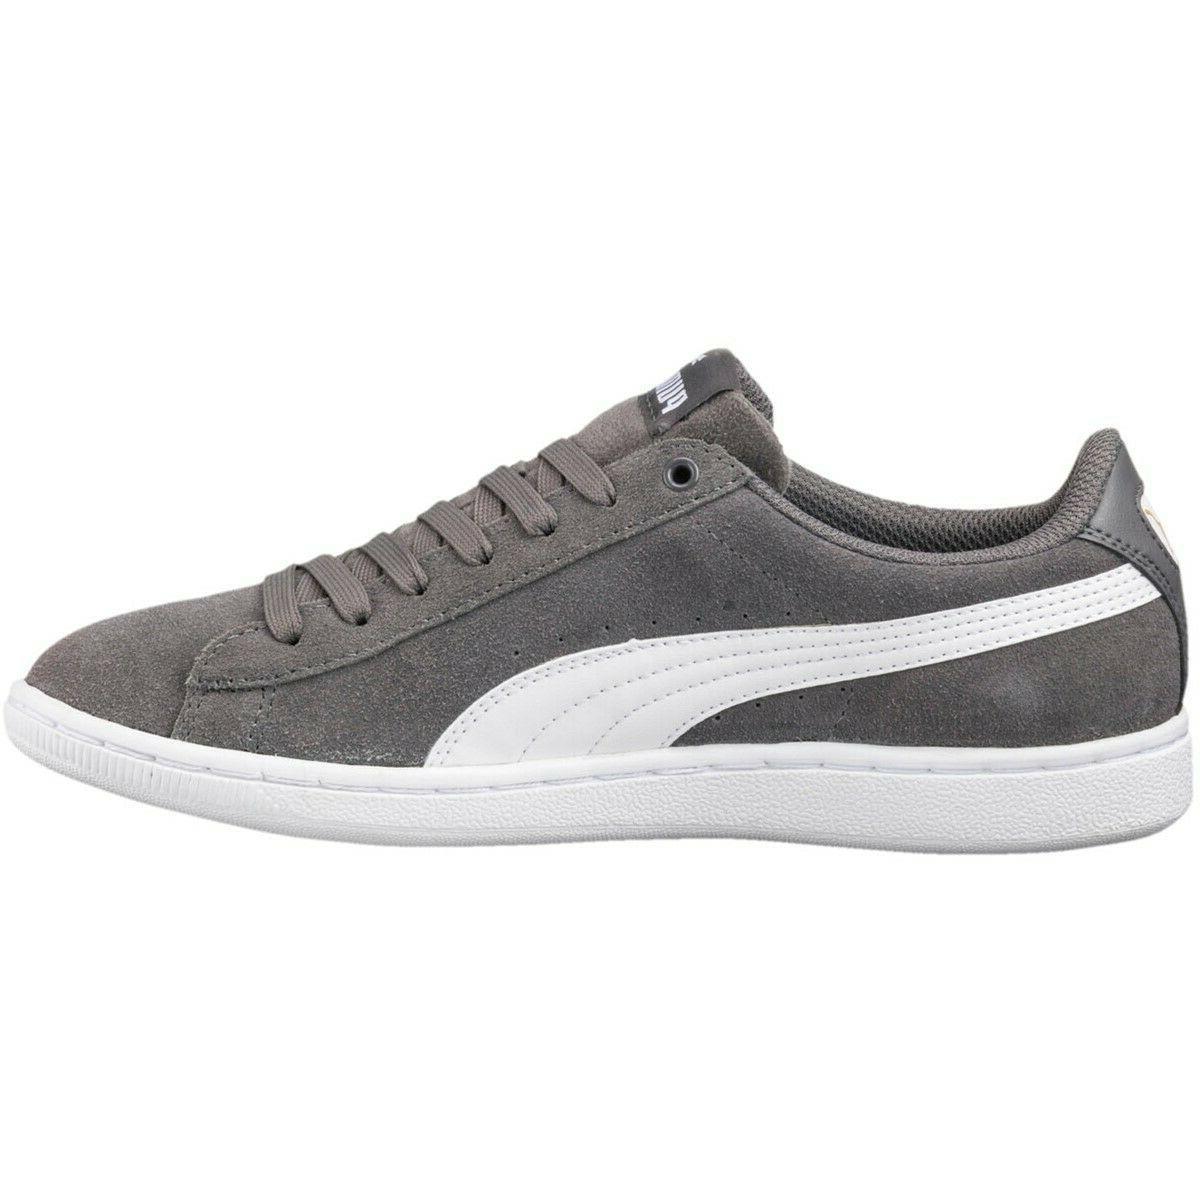 NEW Puma Women's Grey Suede Classic Sneaker SIZE